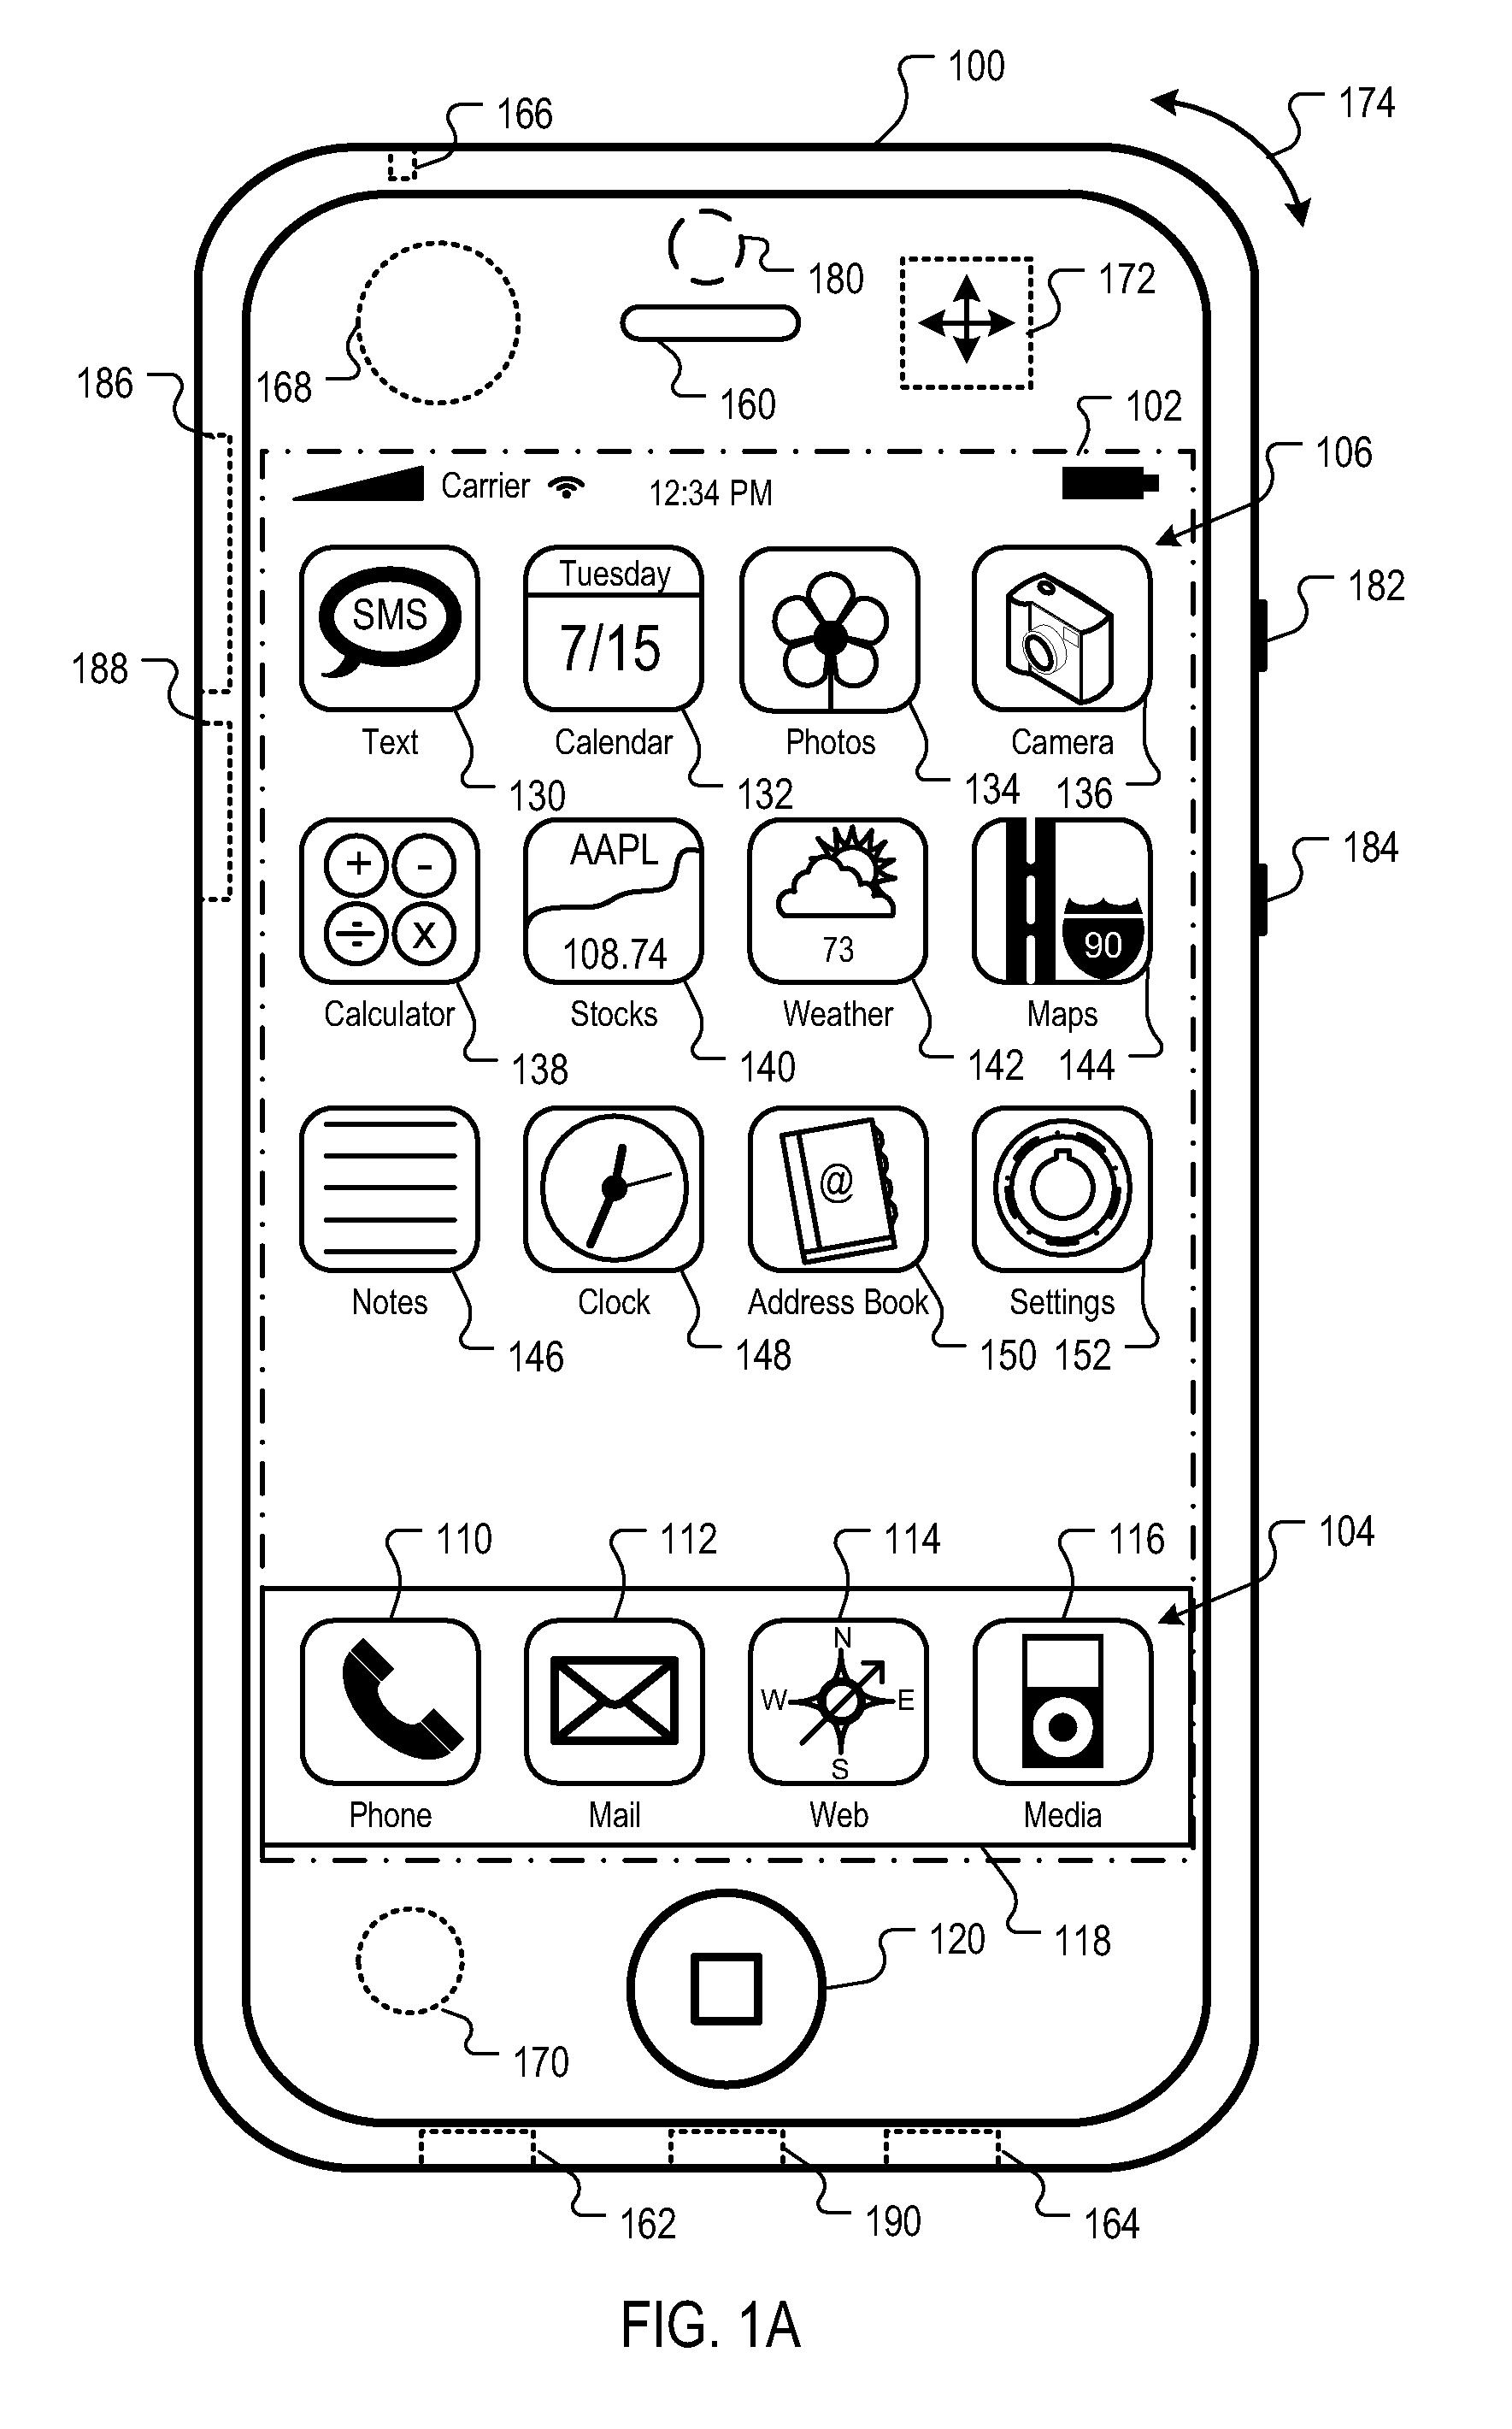 Patent US 8,977,294 B2